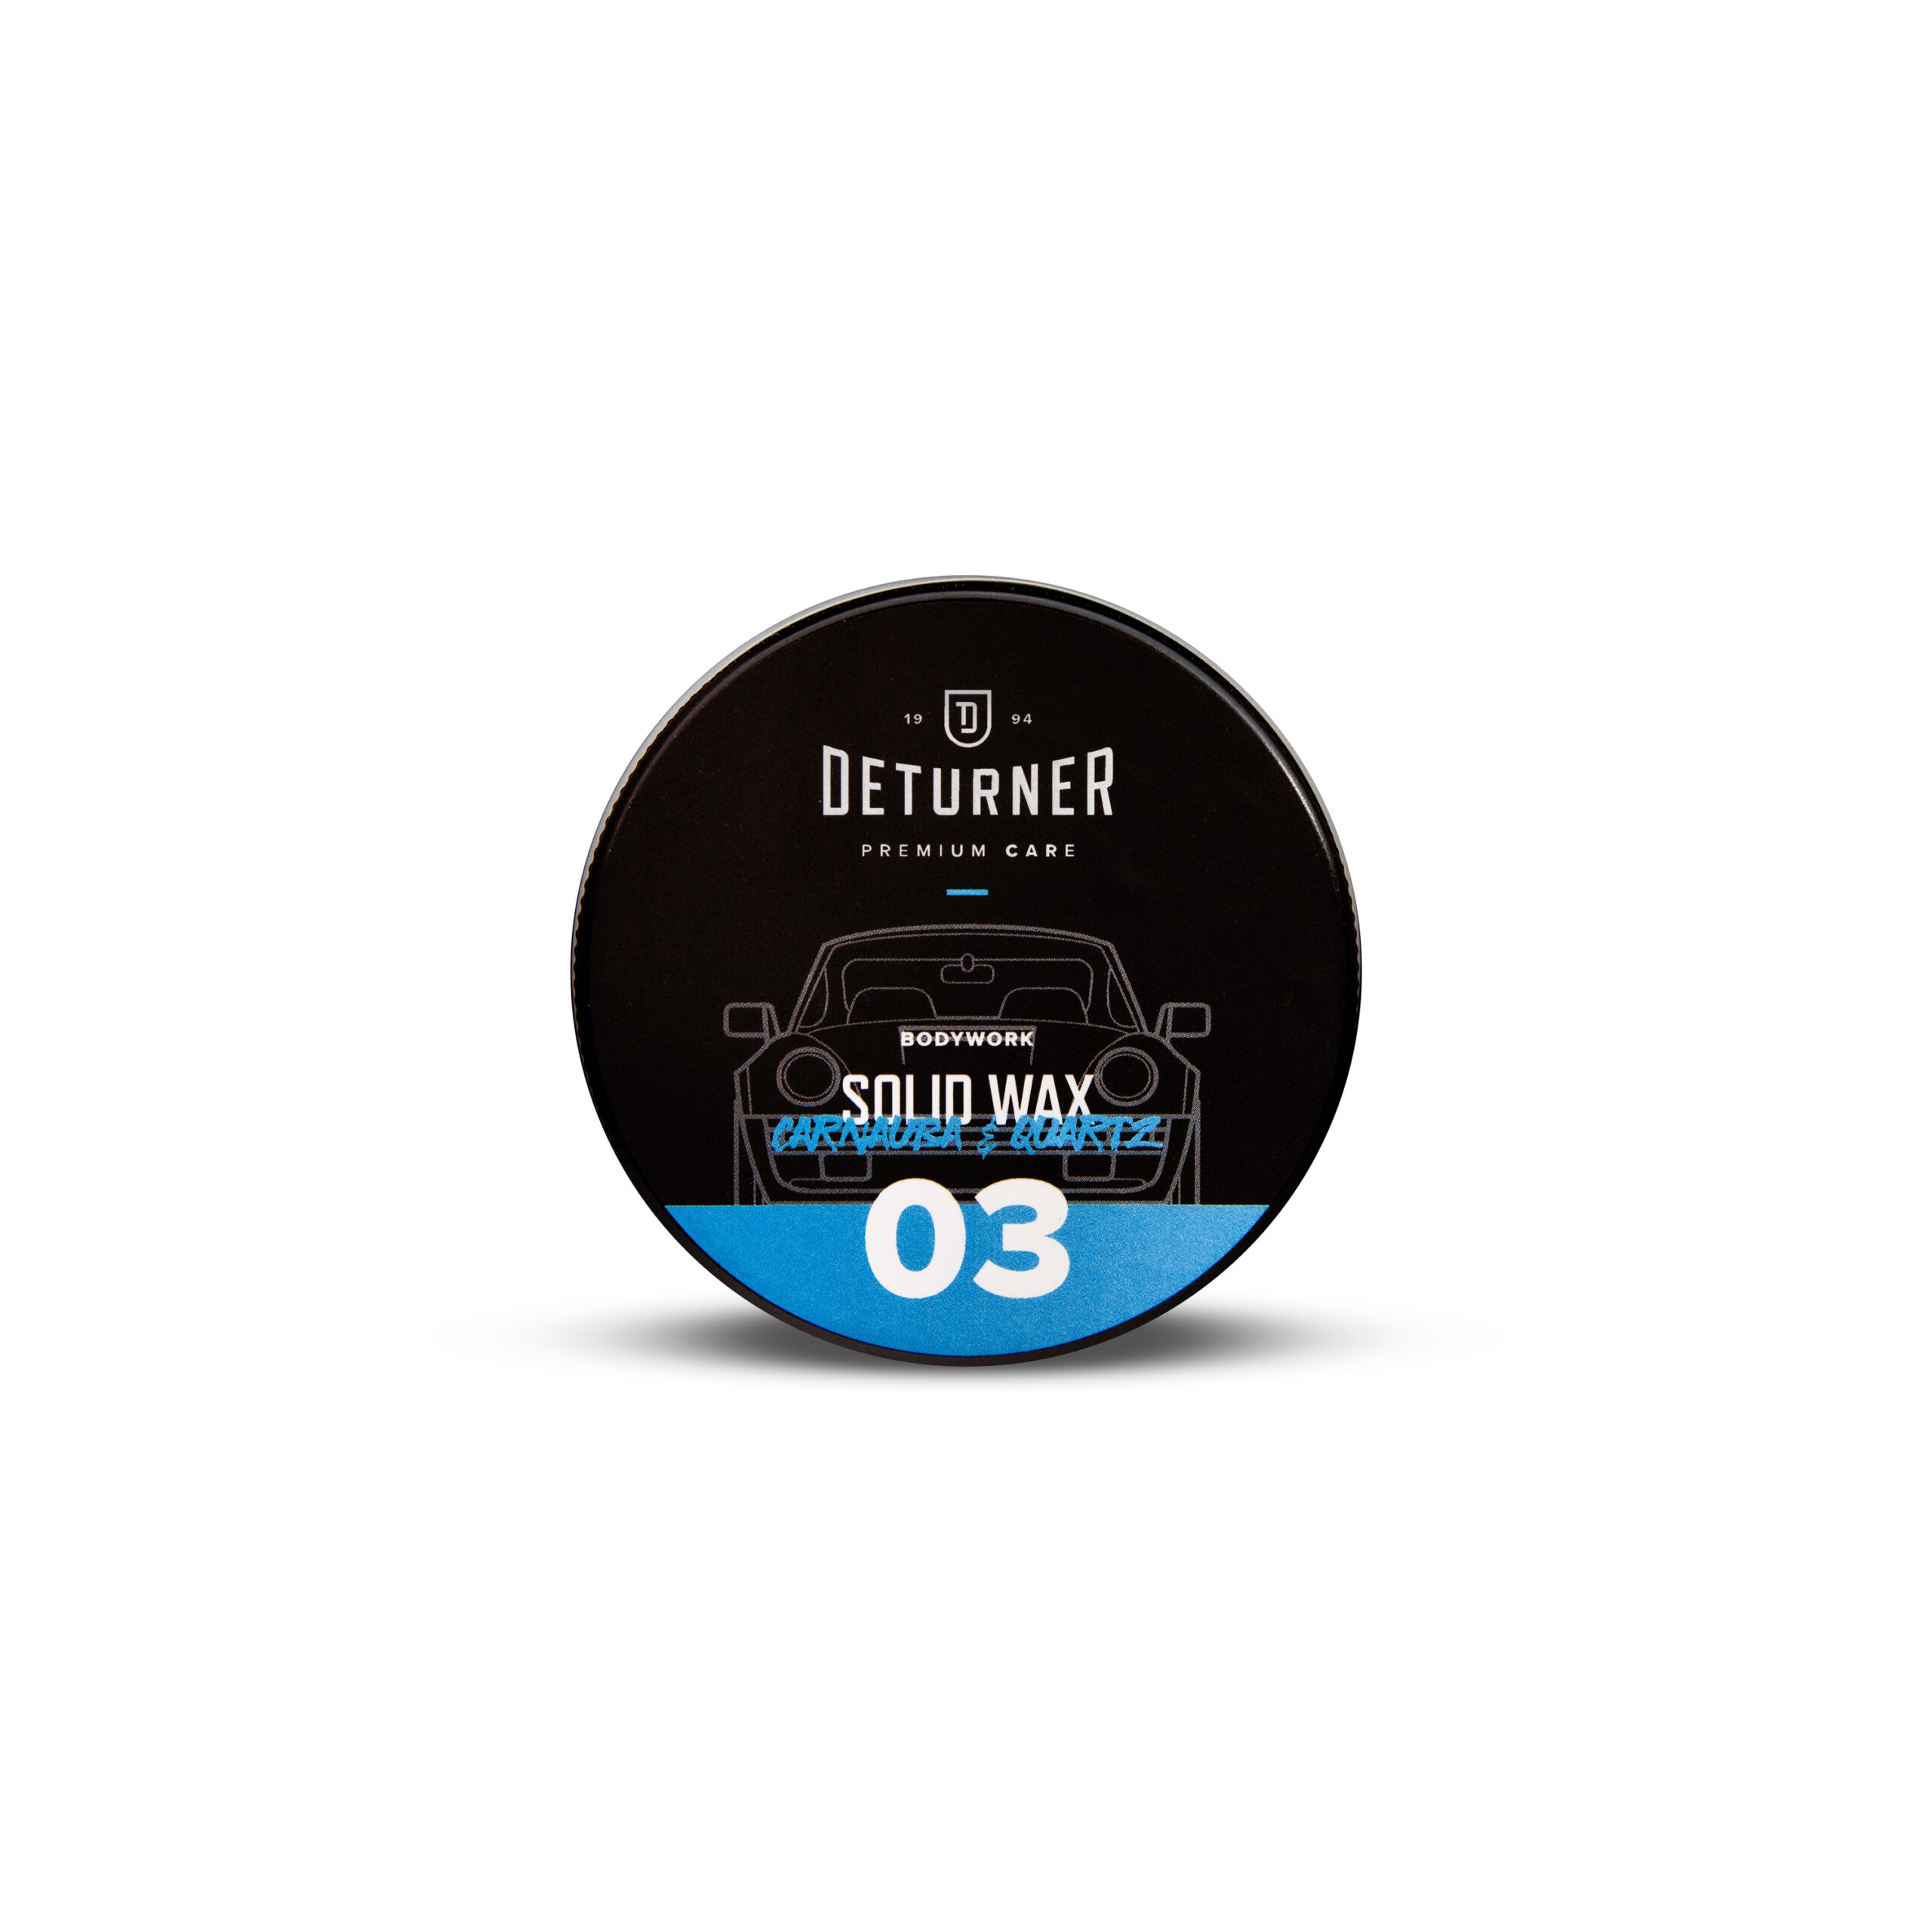 Deturner Solid wax carnauba & quartz 50gr 1